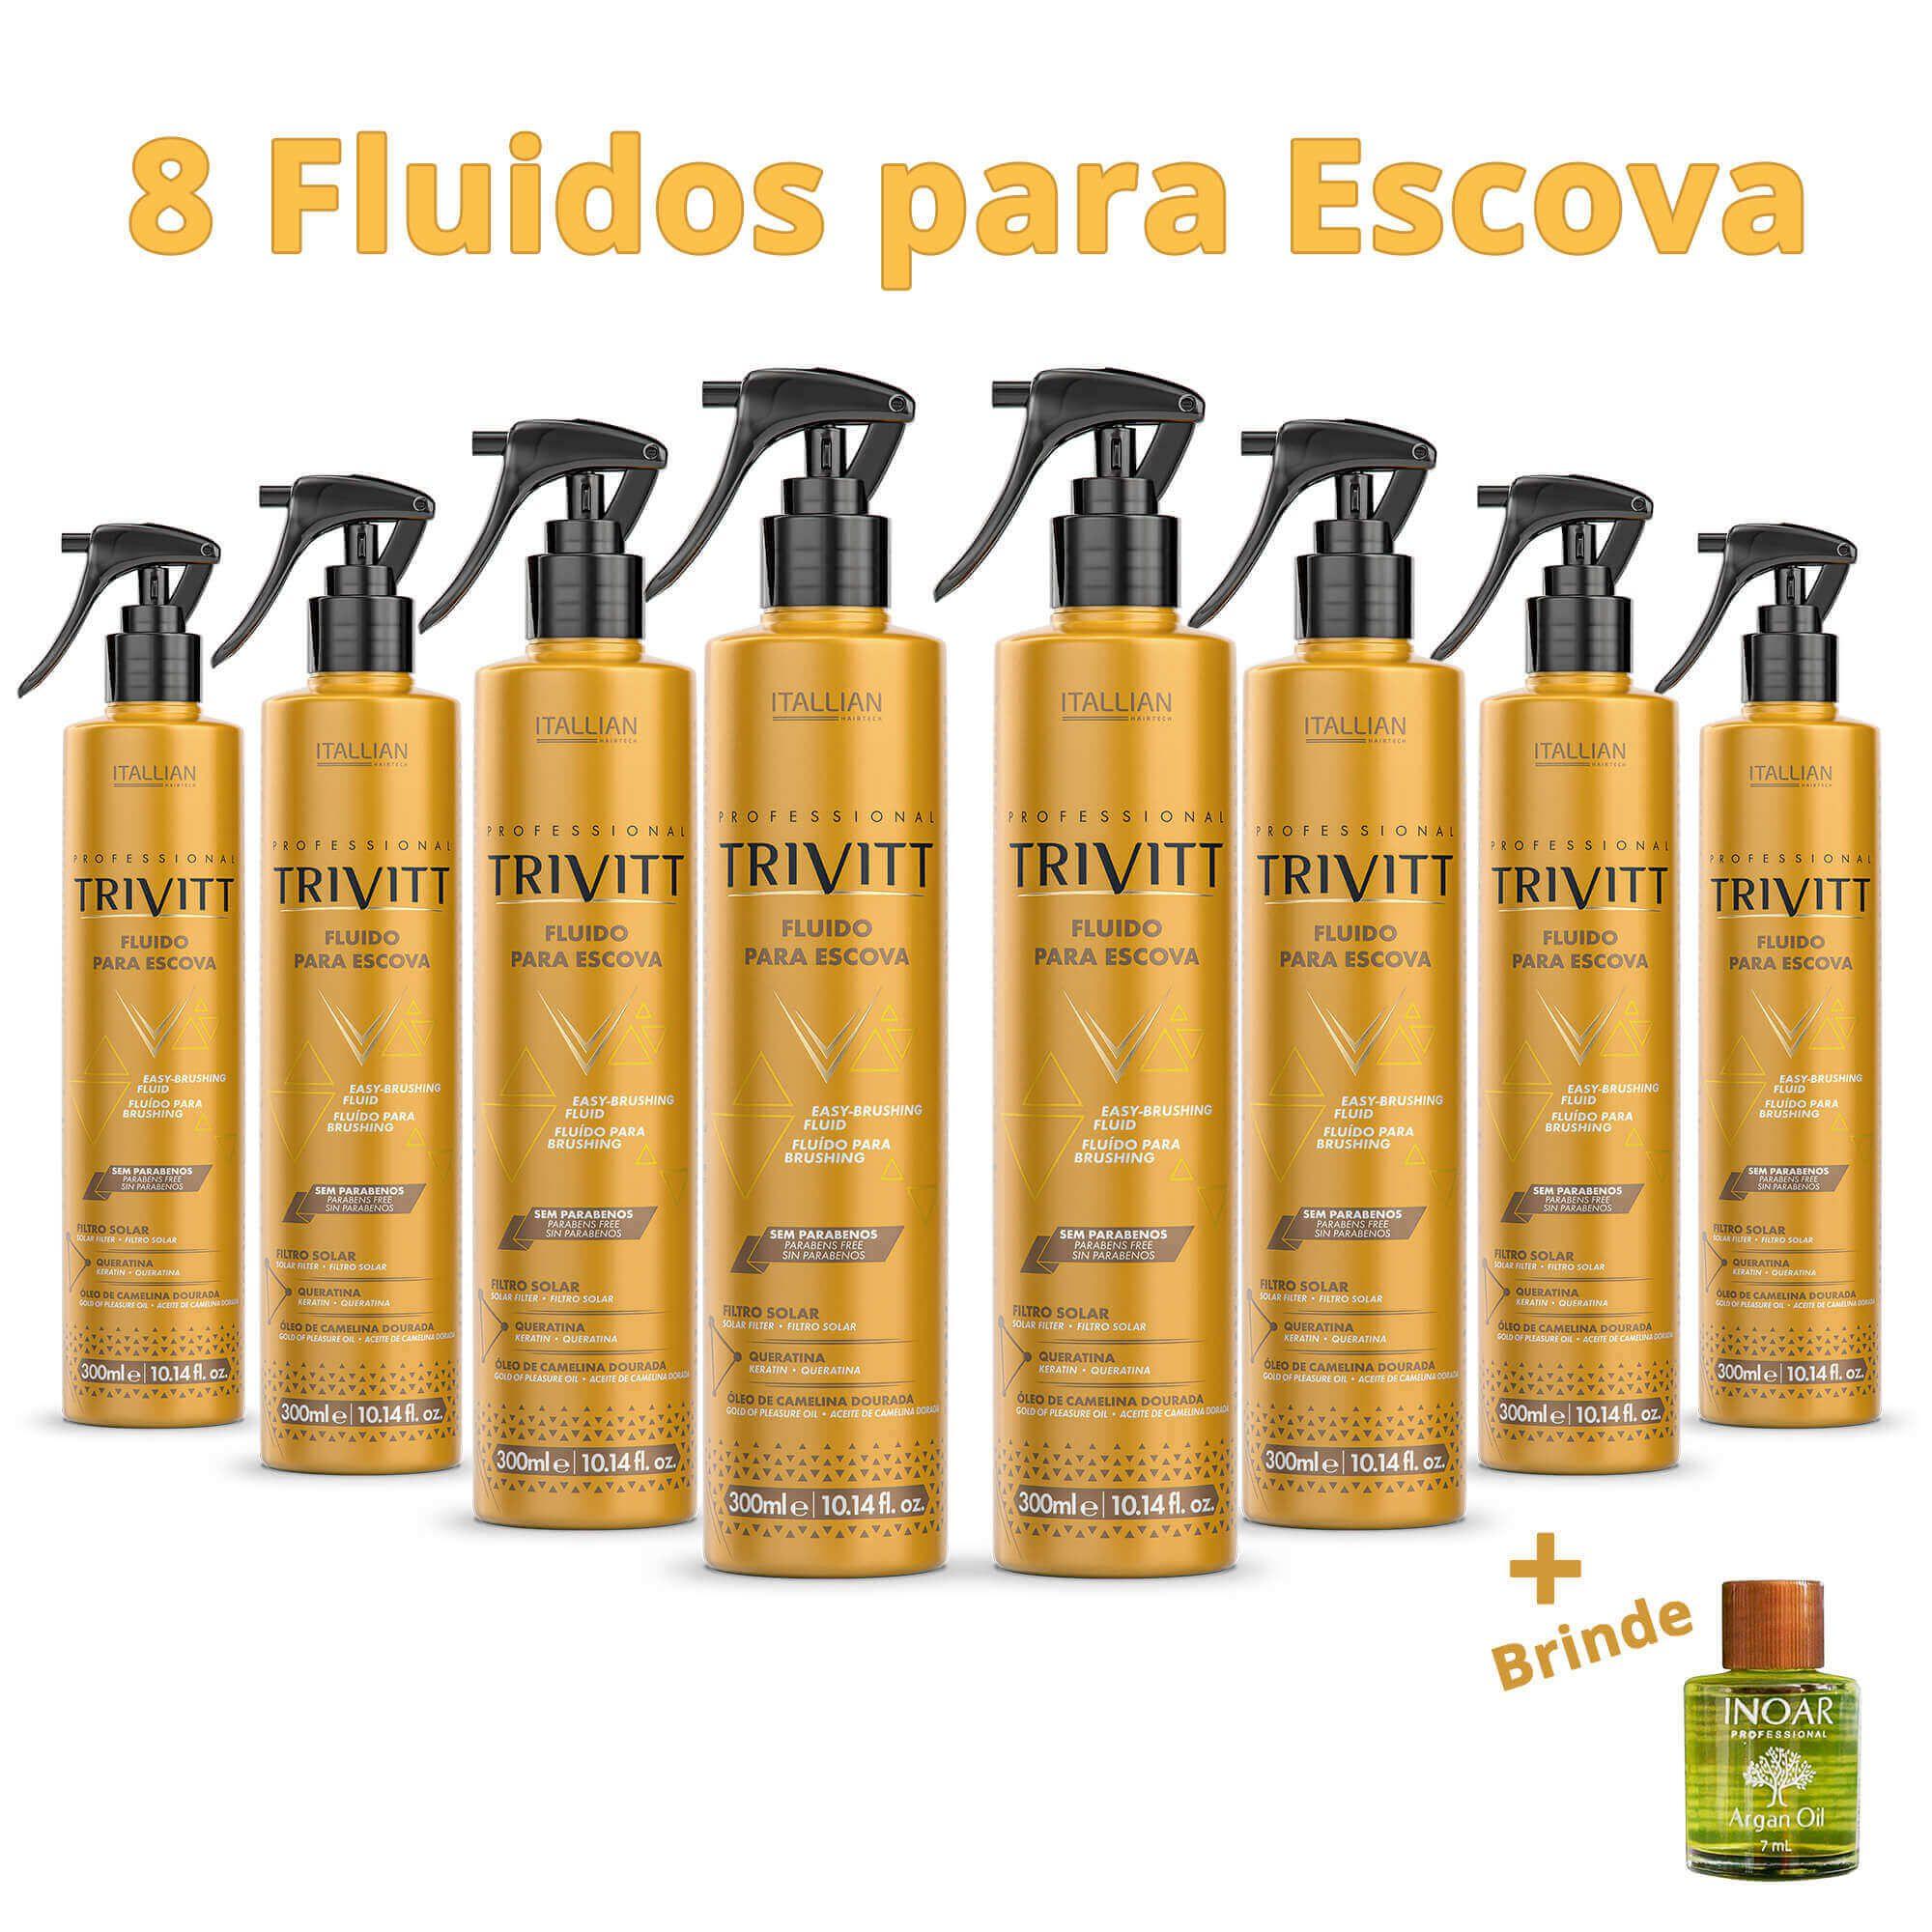 Combo 8 Fluido Para Escova Trivitt 300ml Itallian + Brinde